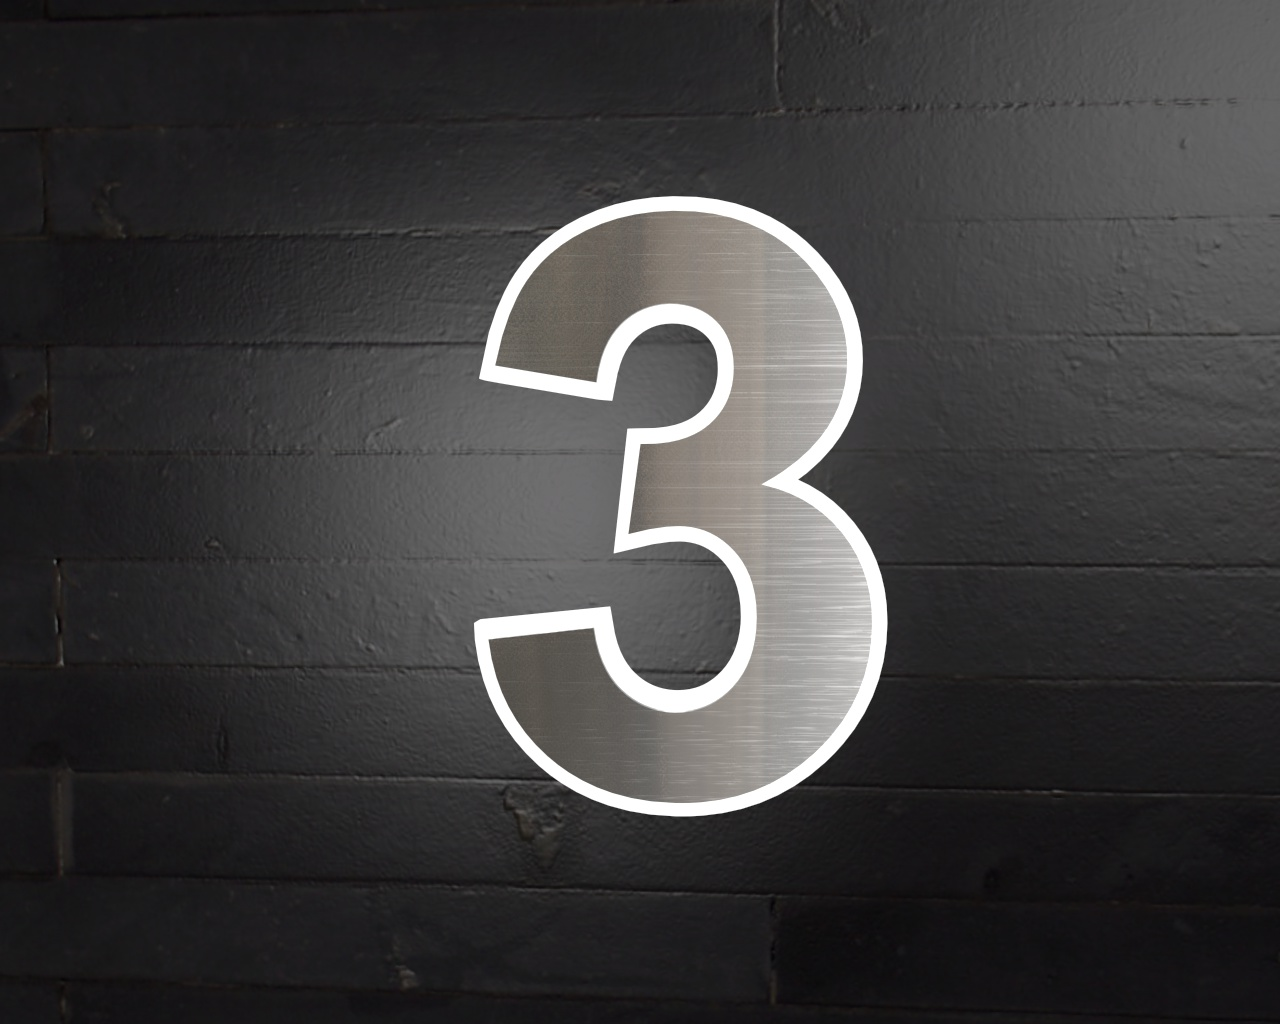 edelstahl hausnummer beleuchtete led edelstahl hausnummer 3. Black Bedroom Furniture Sets. Home Design Ideas